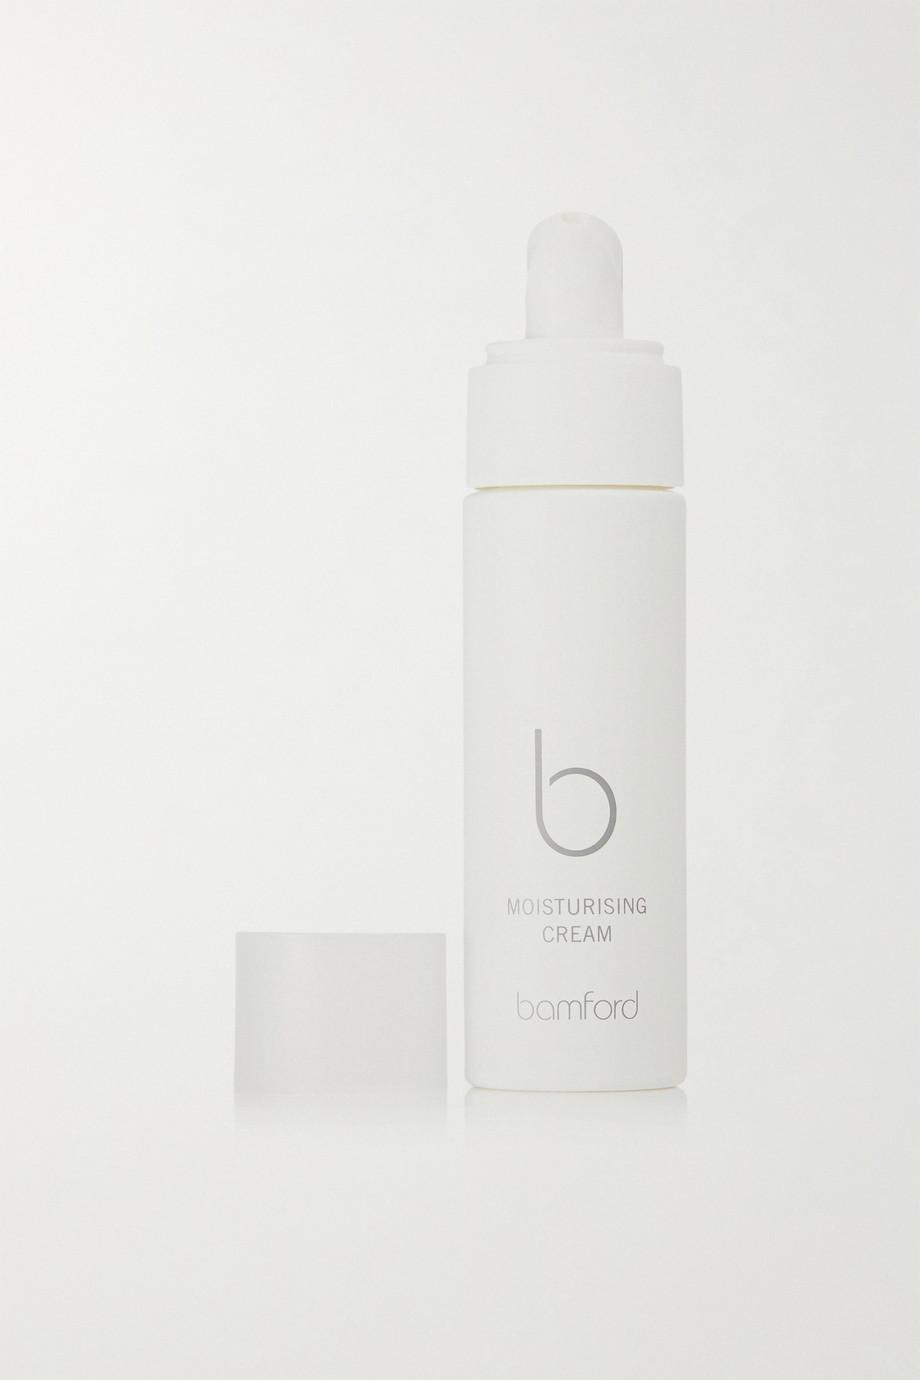 Bamford Moisturising Cream, 50ml - Feuchtigkeitscreme